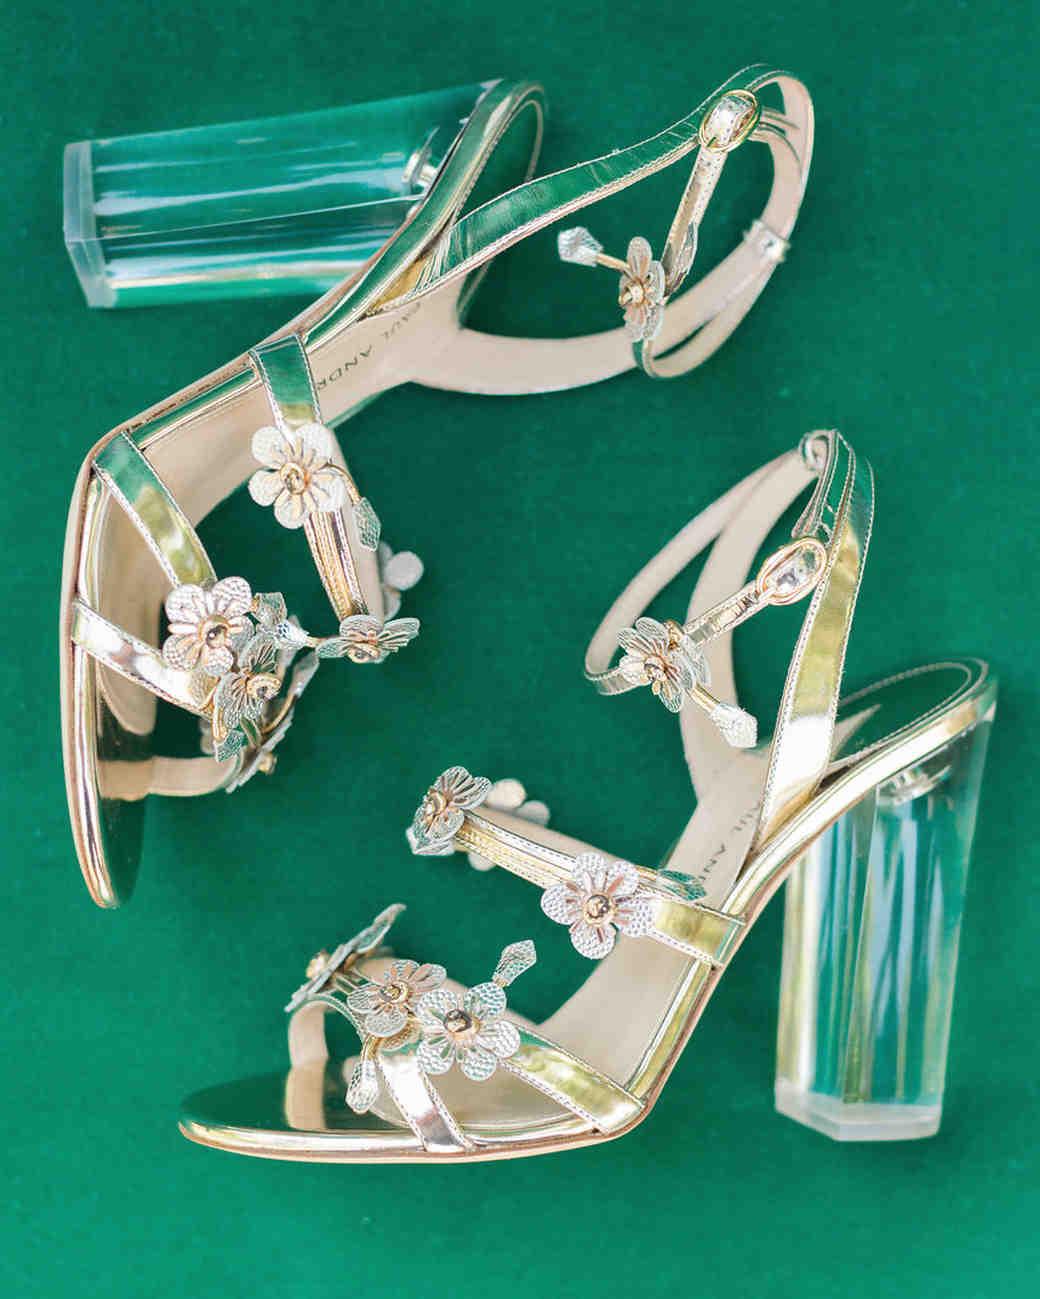 emily adhir wedding heels